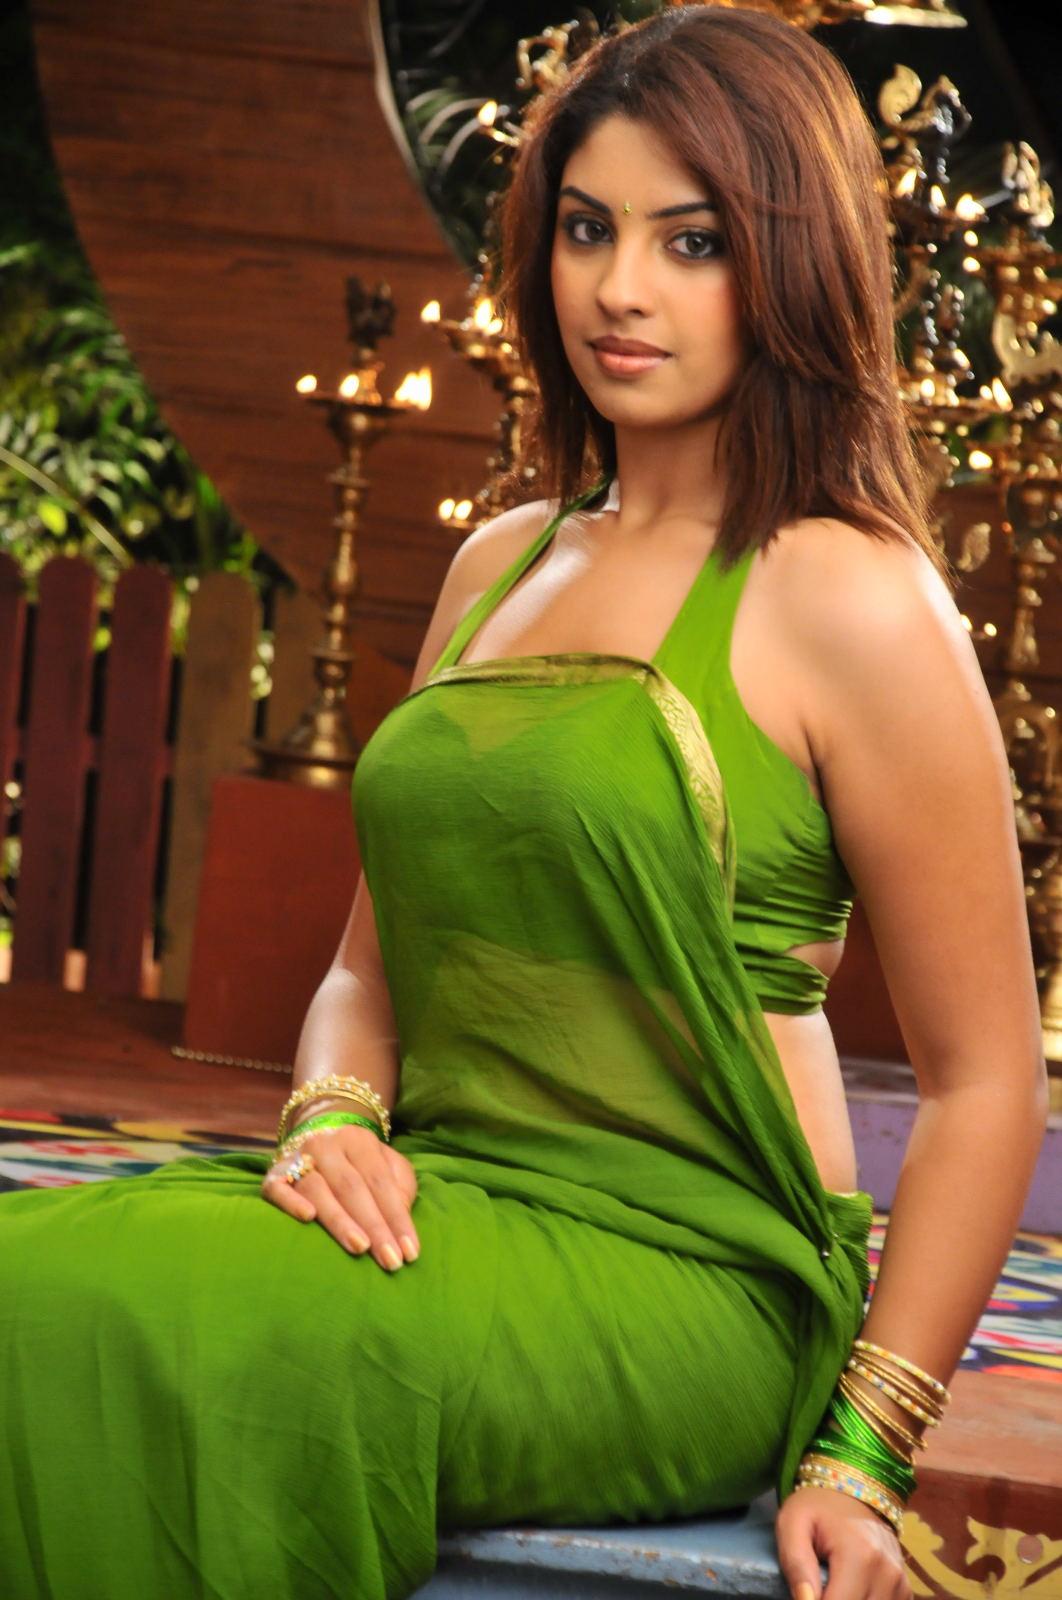 Richa Gangopadhyay Hot Saree Photos in Mirapakay Movie, Richa Gangopadhyay  Hot Pics in Saree From Mirapakay Movie - South Indian Actress - Photos and  Videos of beautiful actress -